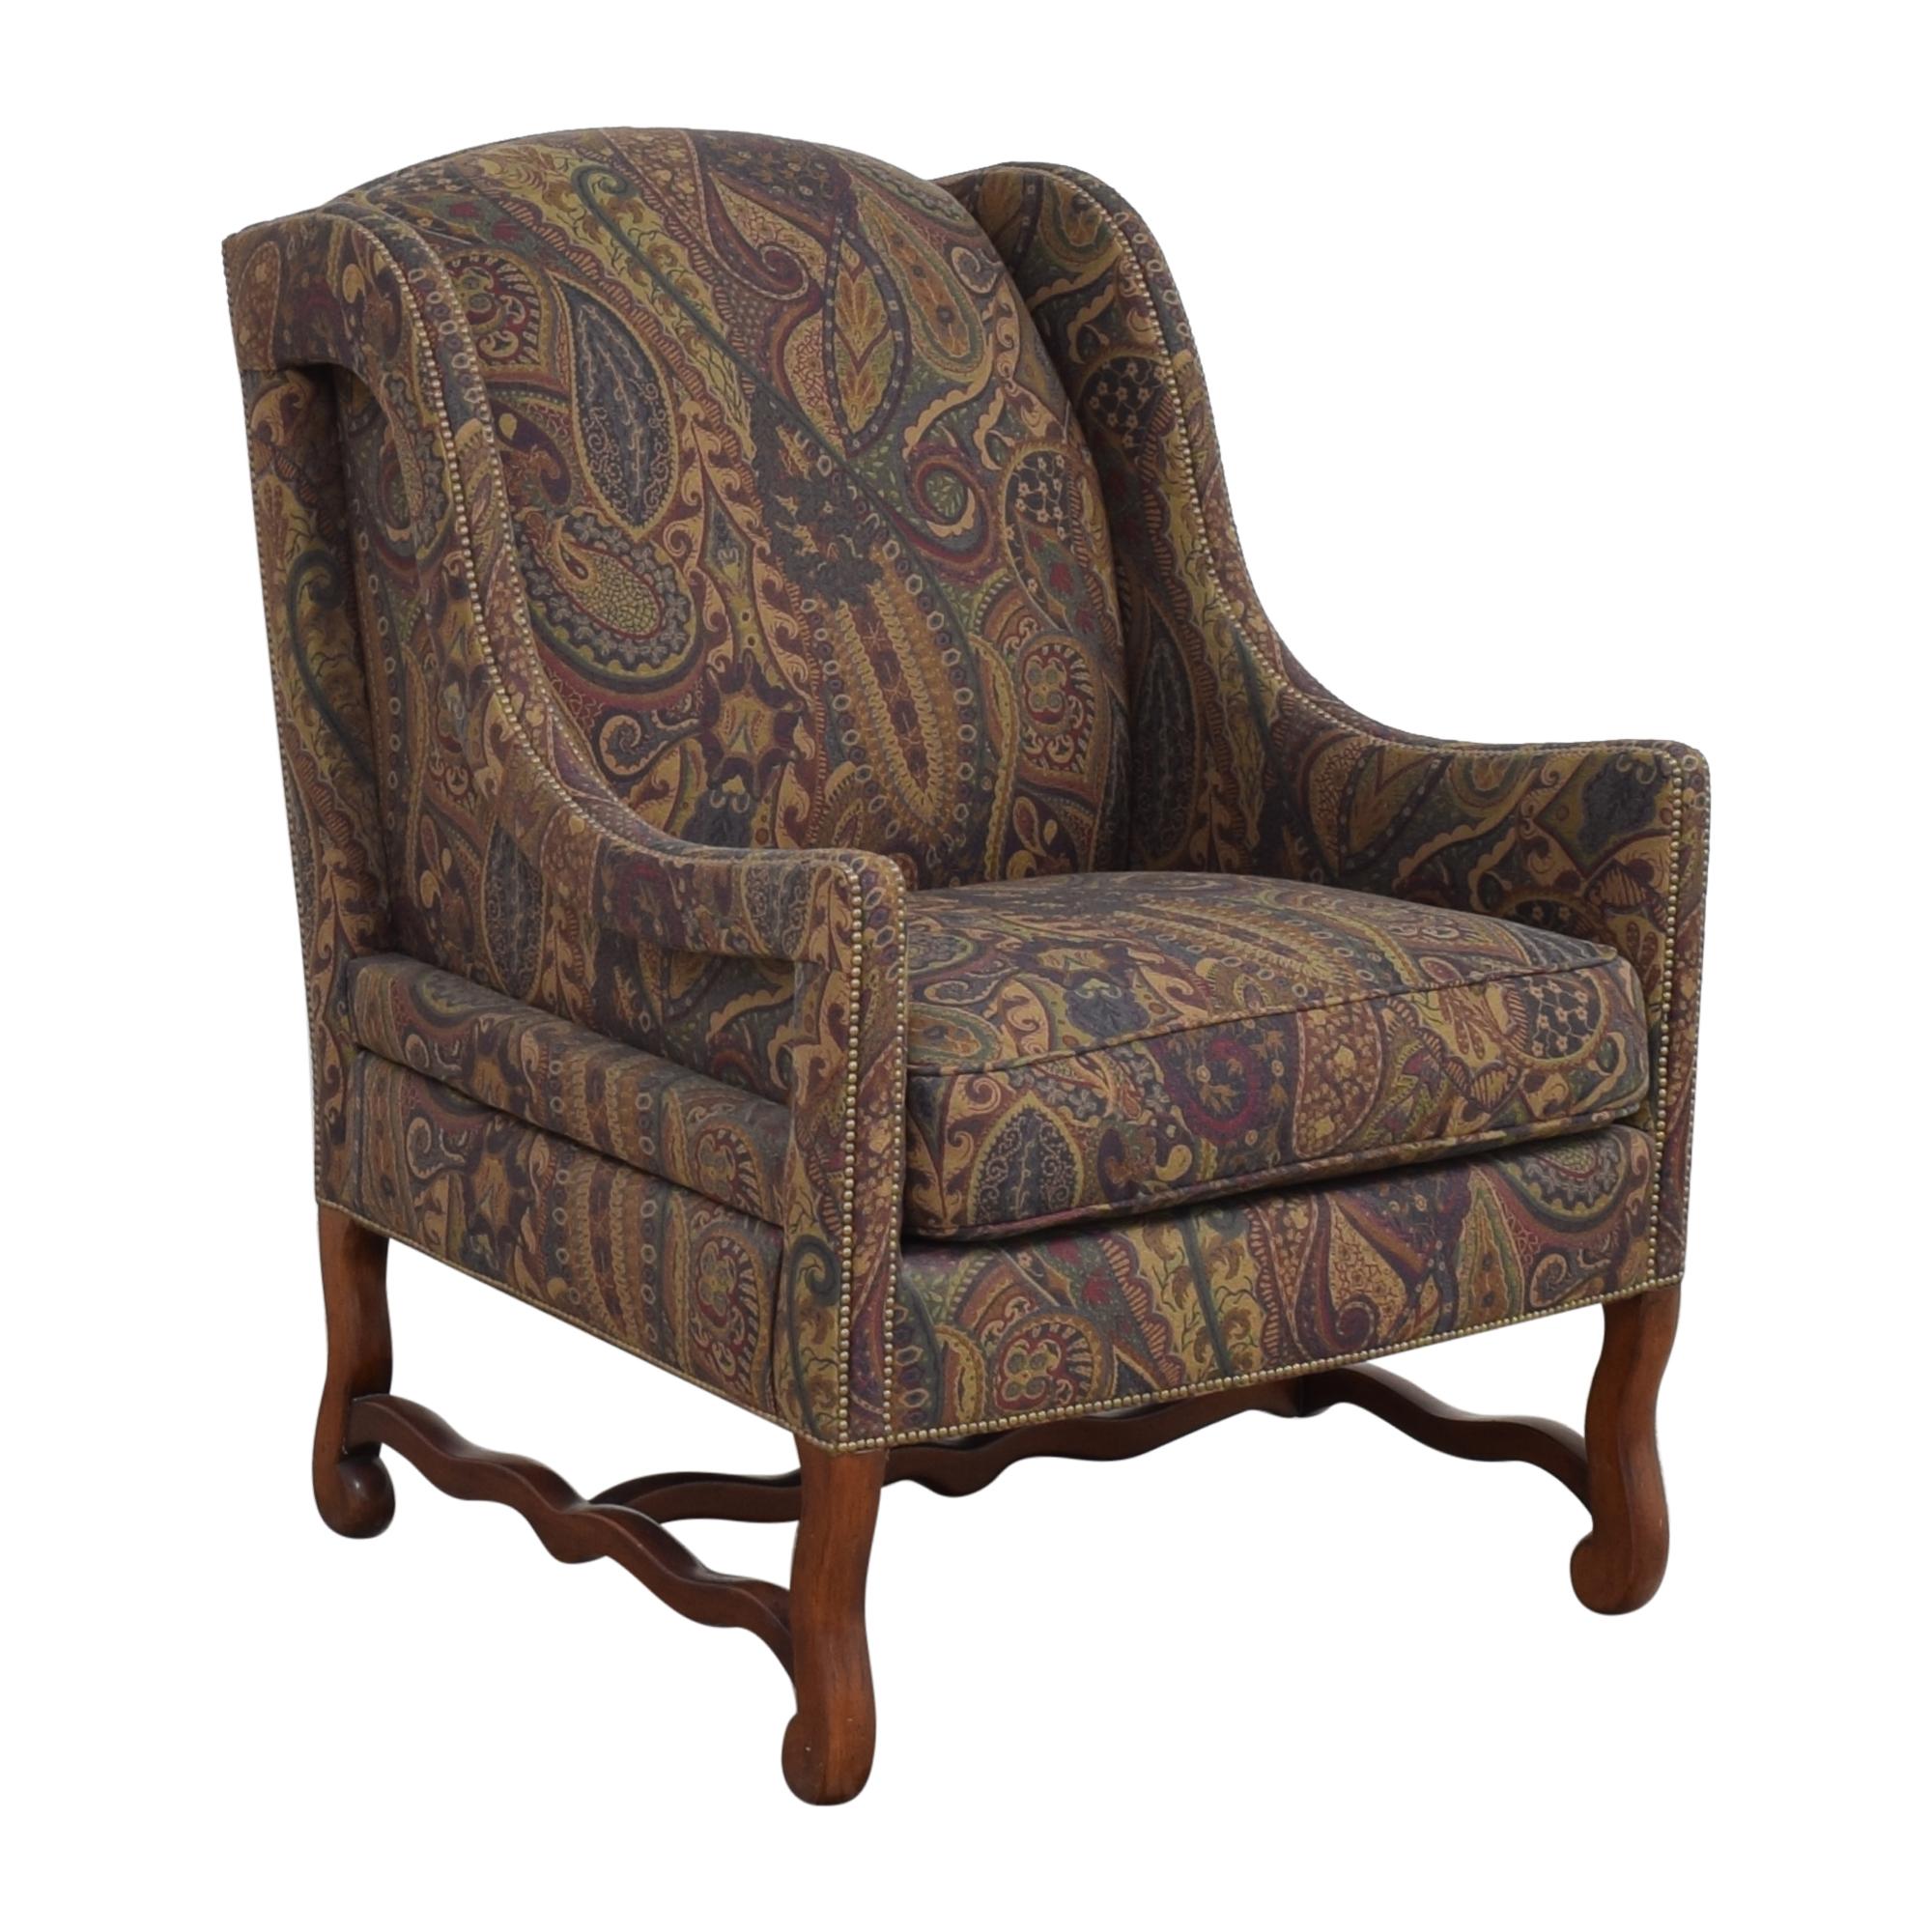 buy Beacon Hill Collection Beacon Hill Paisley Armchair online